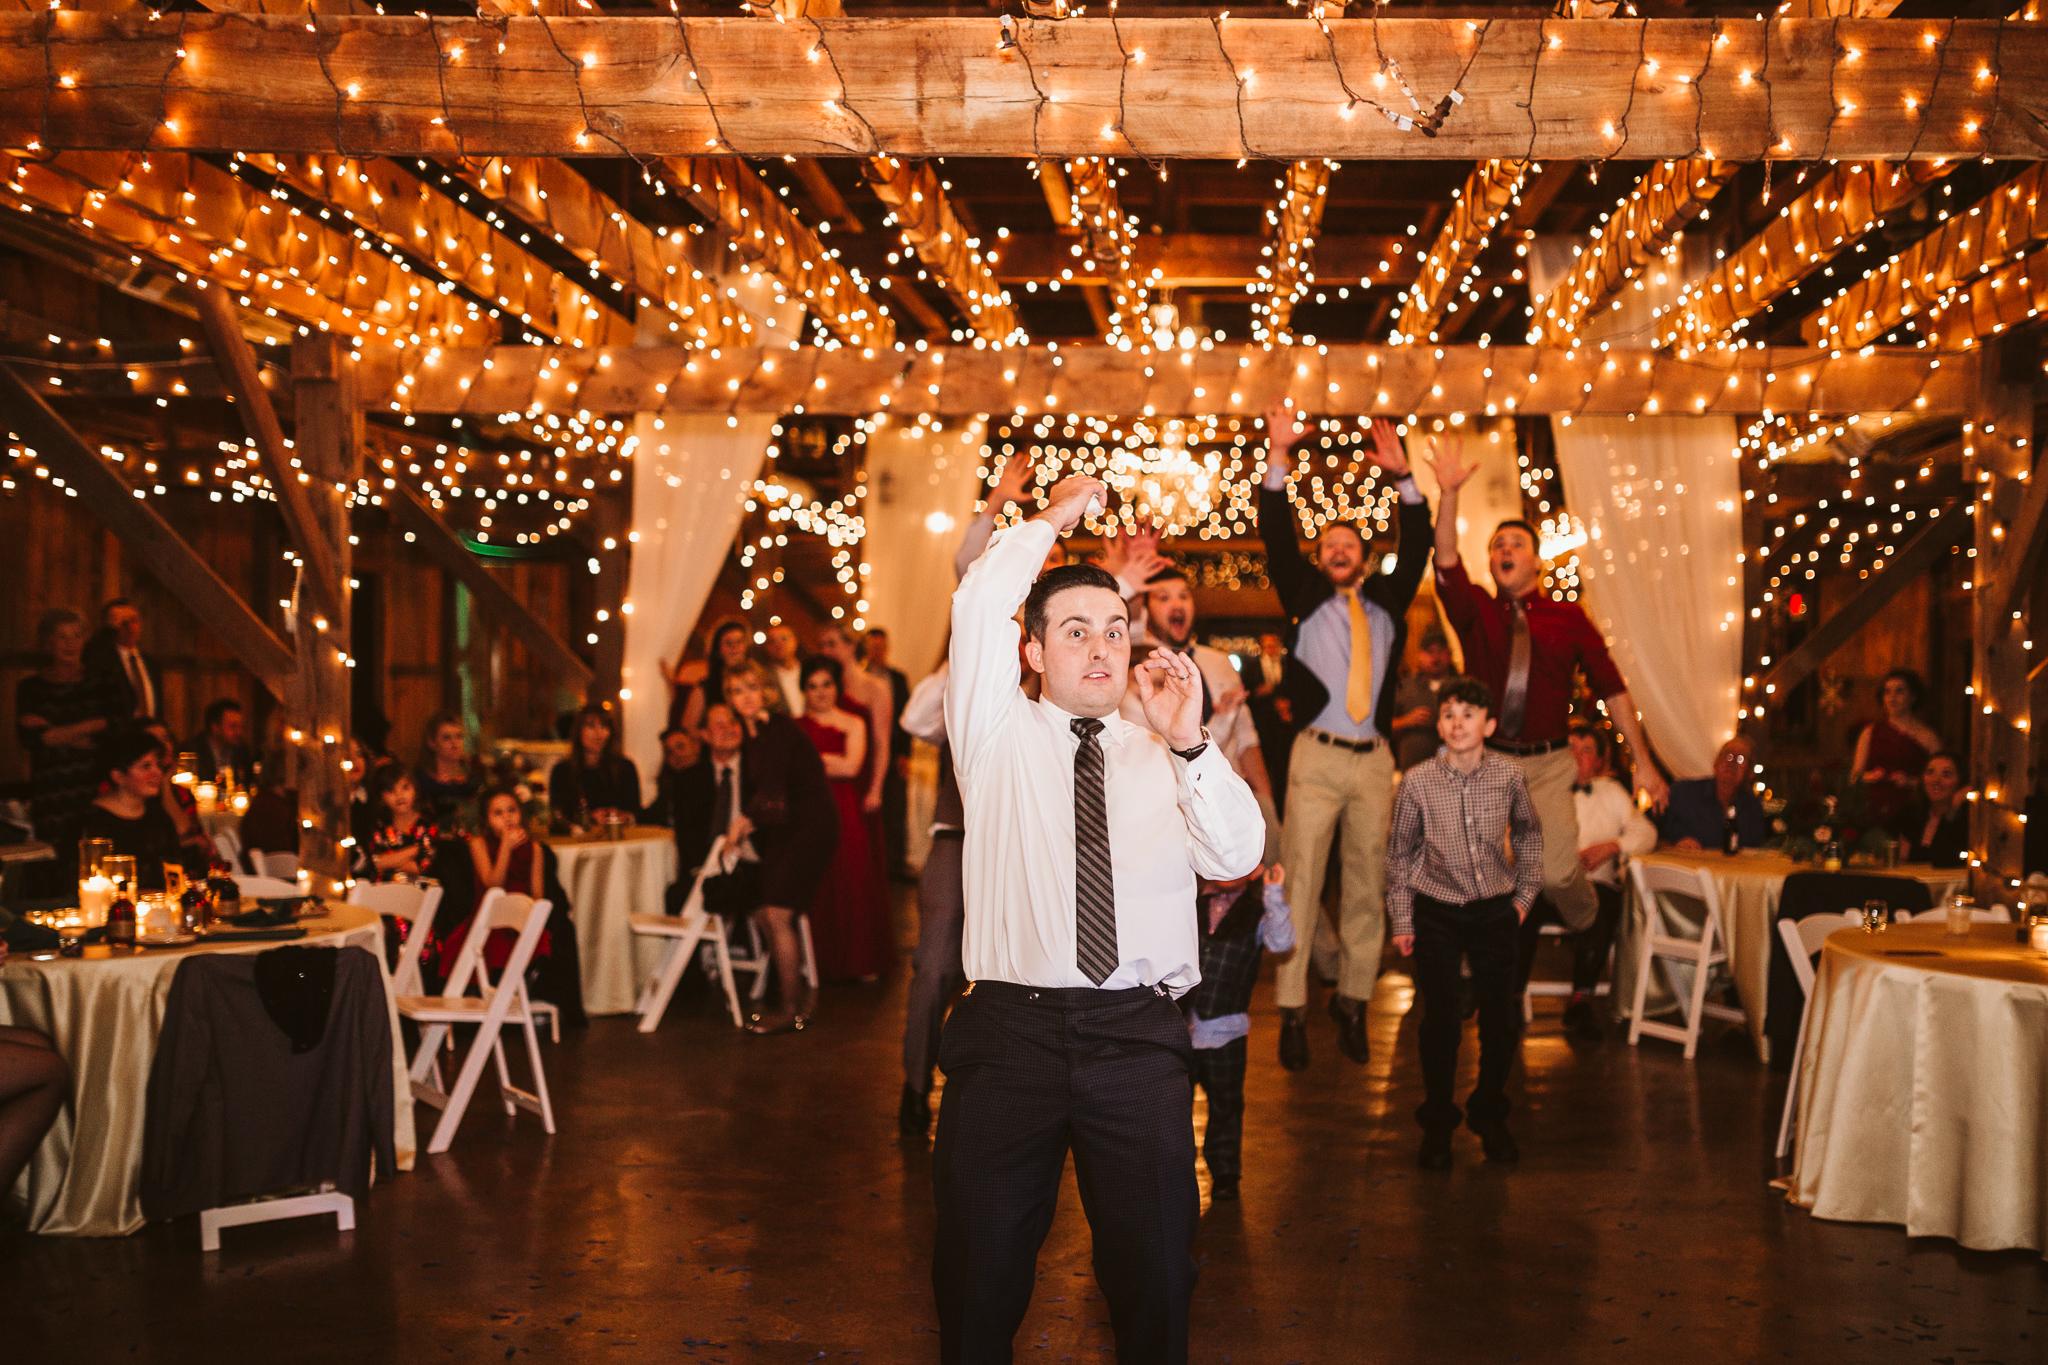 0178 Ariana Jordan Photo - Cameron & Lauren's Wedding at Talon Winery  8266.jpg